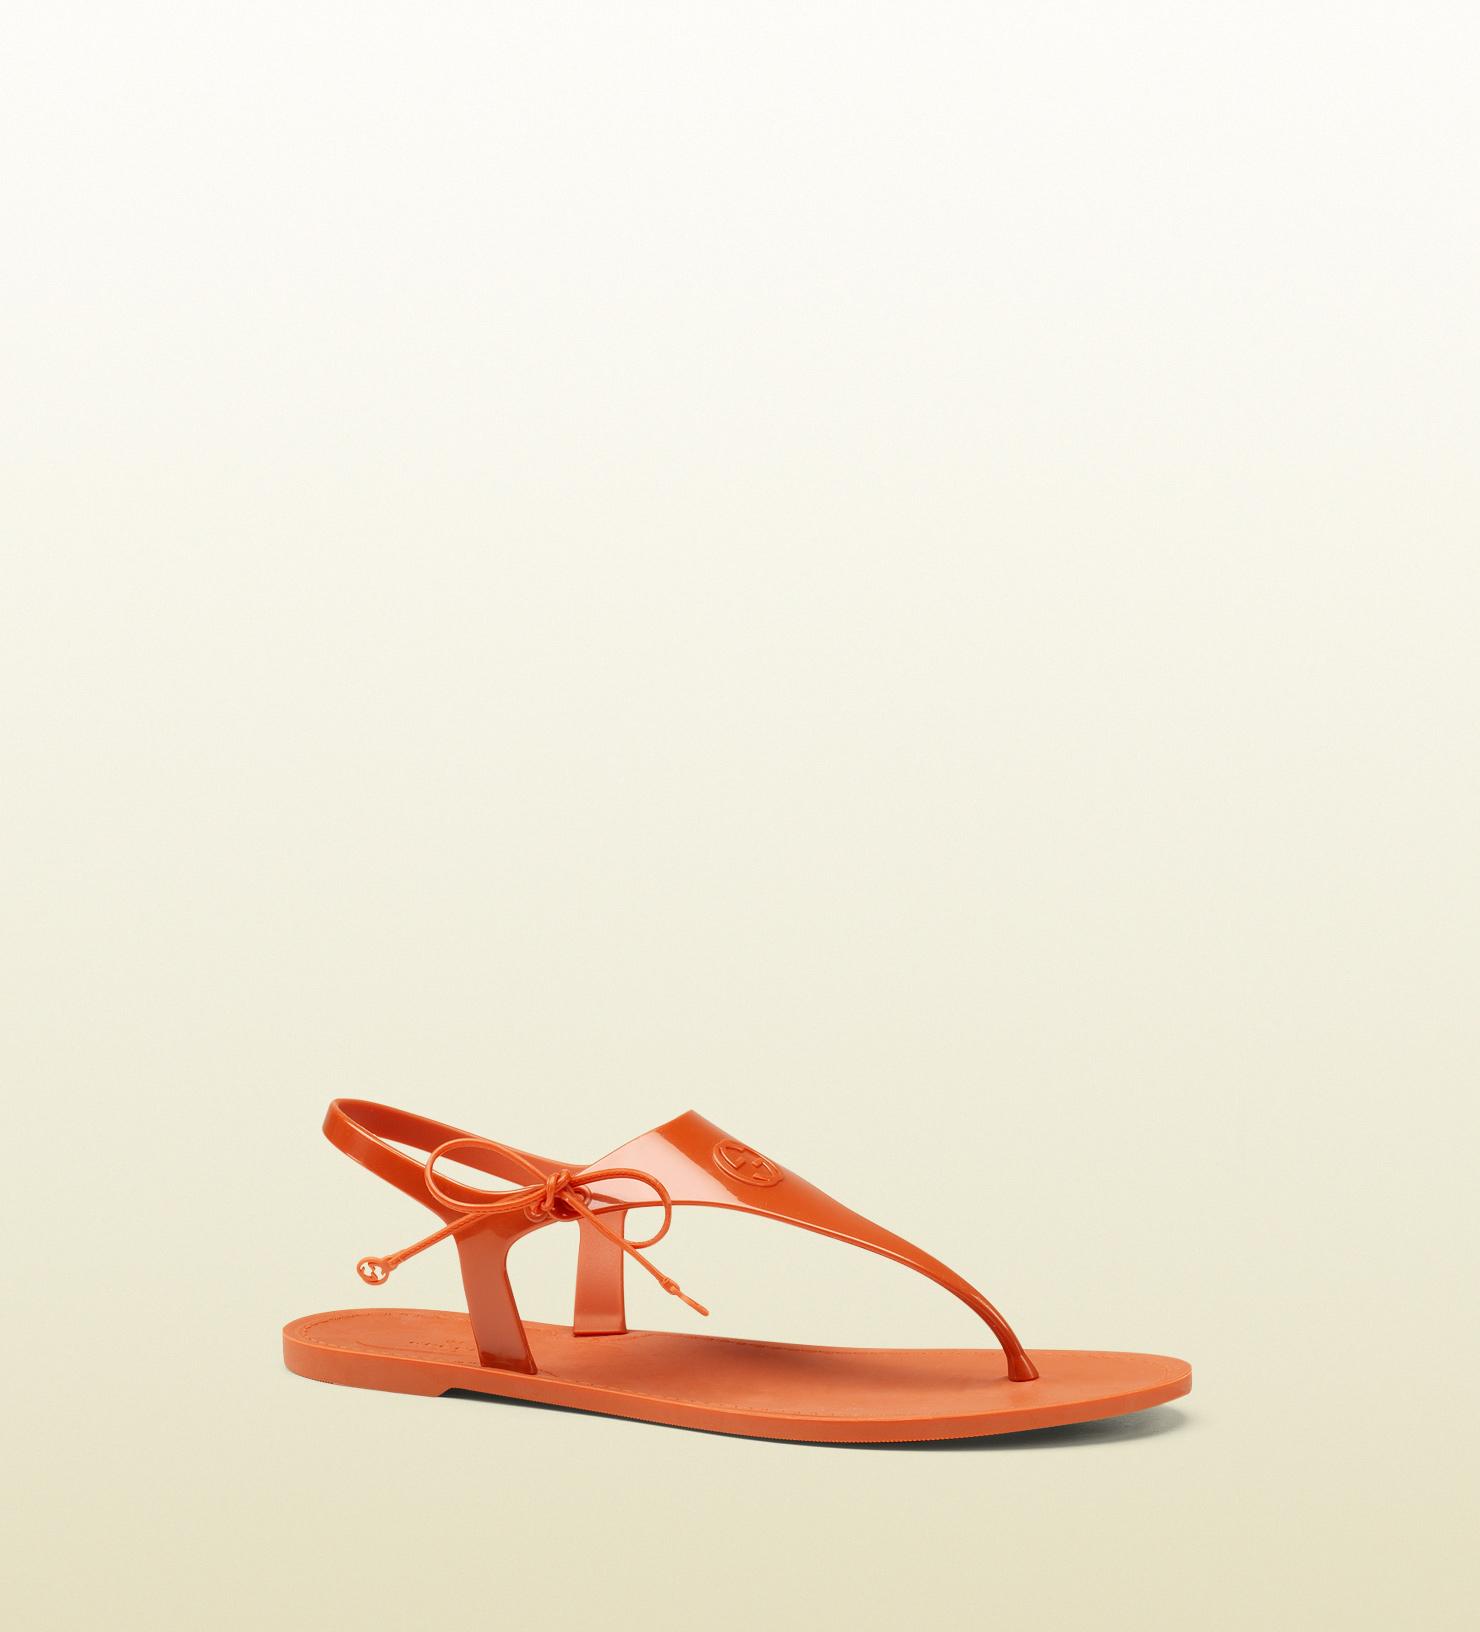 Gucci Katina Bioplastic Rubber Thong Sandal In Orange Lyst